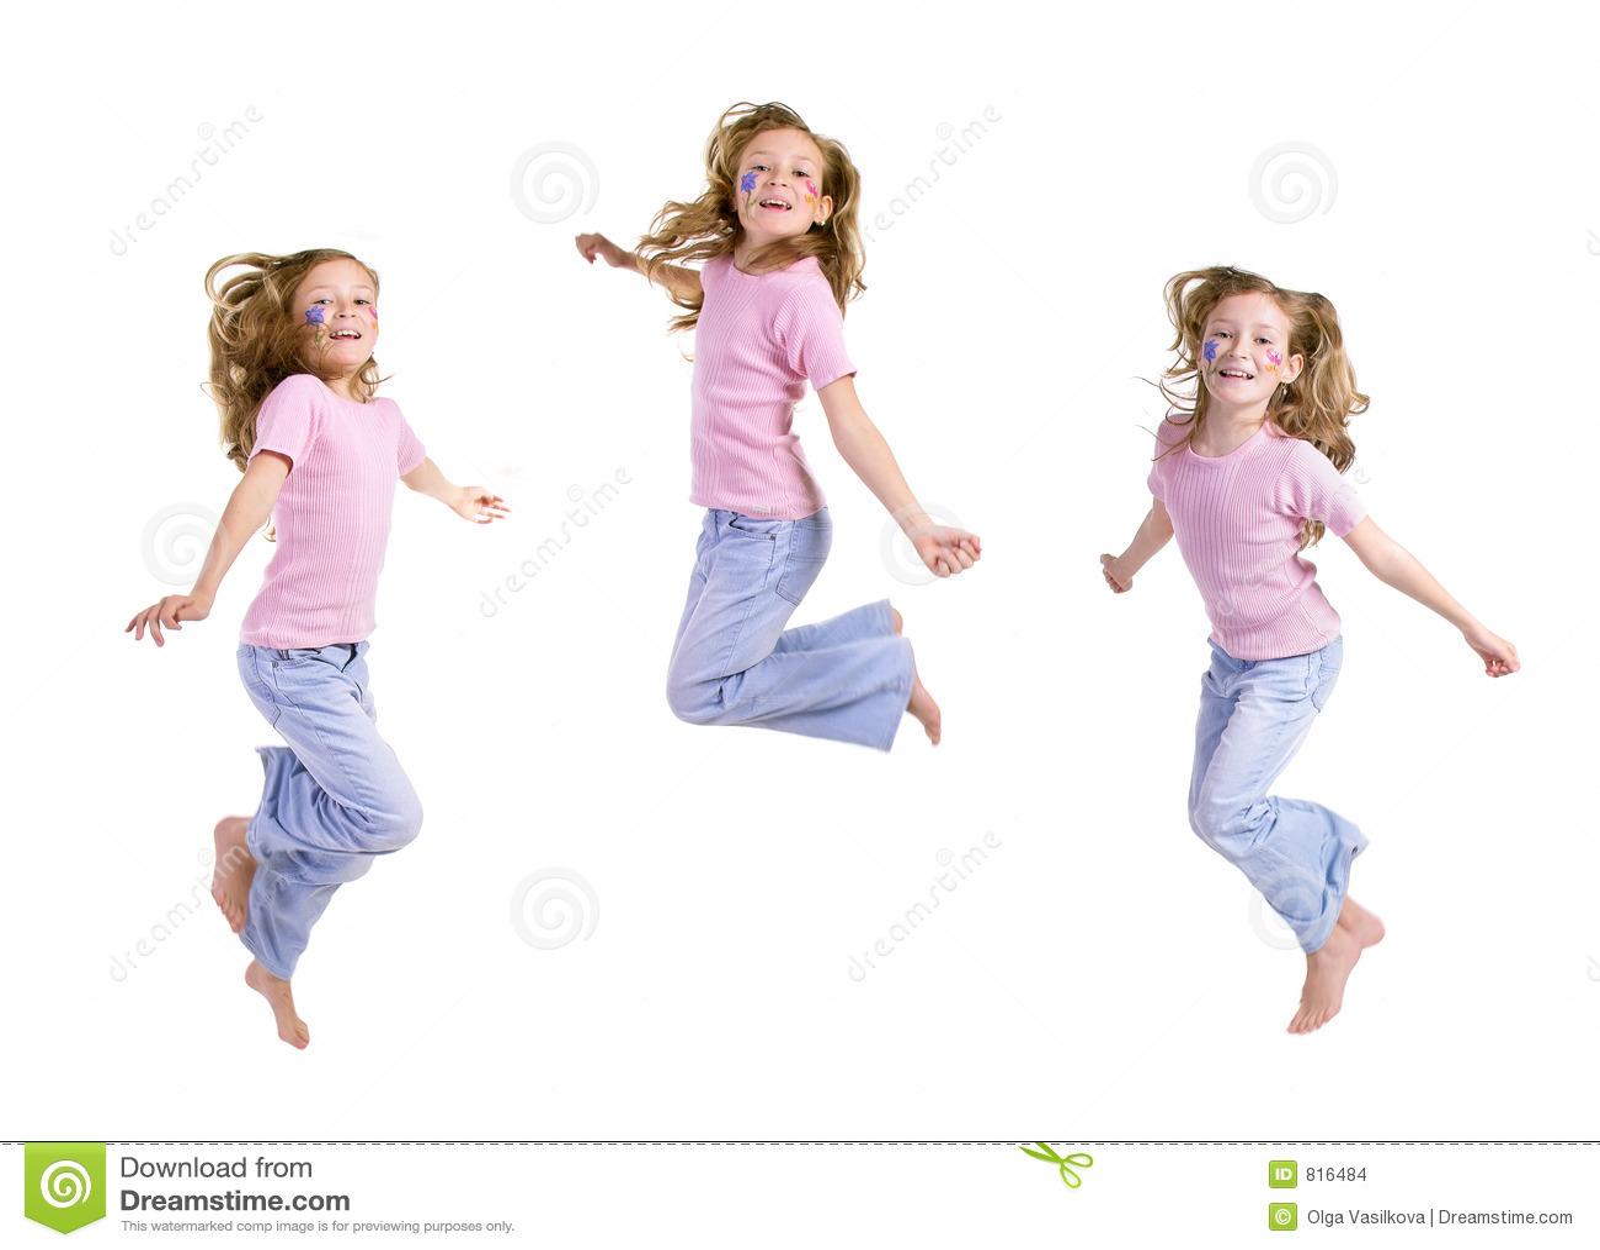 Sprong, ondergeschikte vreugde,